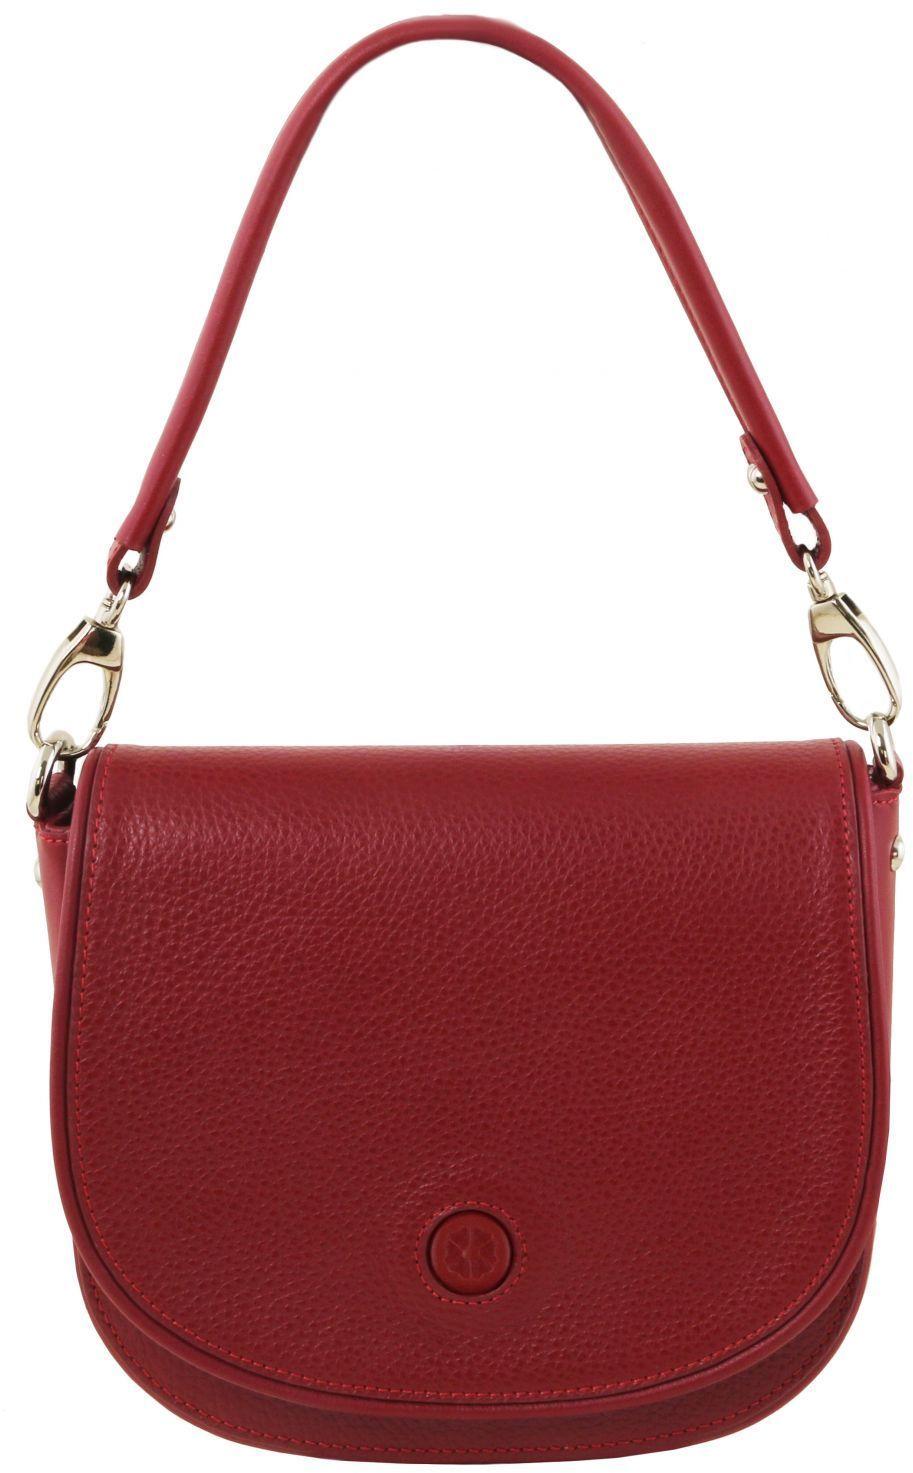 c531a758cd Γυναικεία Τσάντα Ώμου Δερμάτινη Rosa Κόκκινο Tuscany Leather